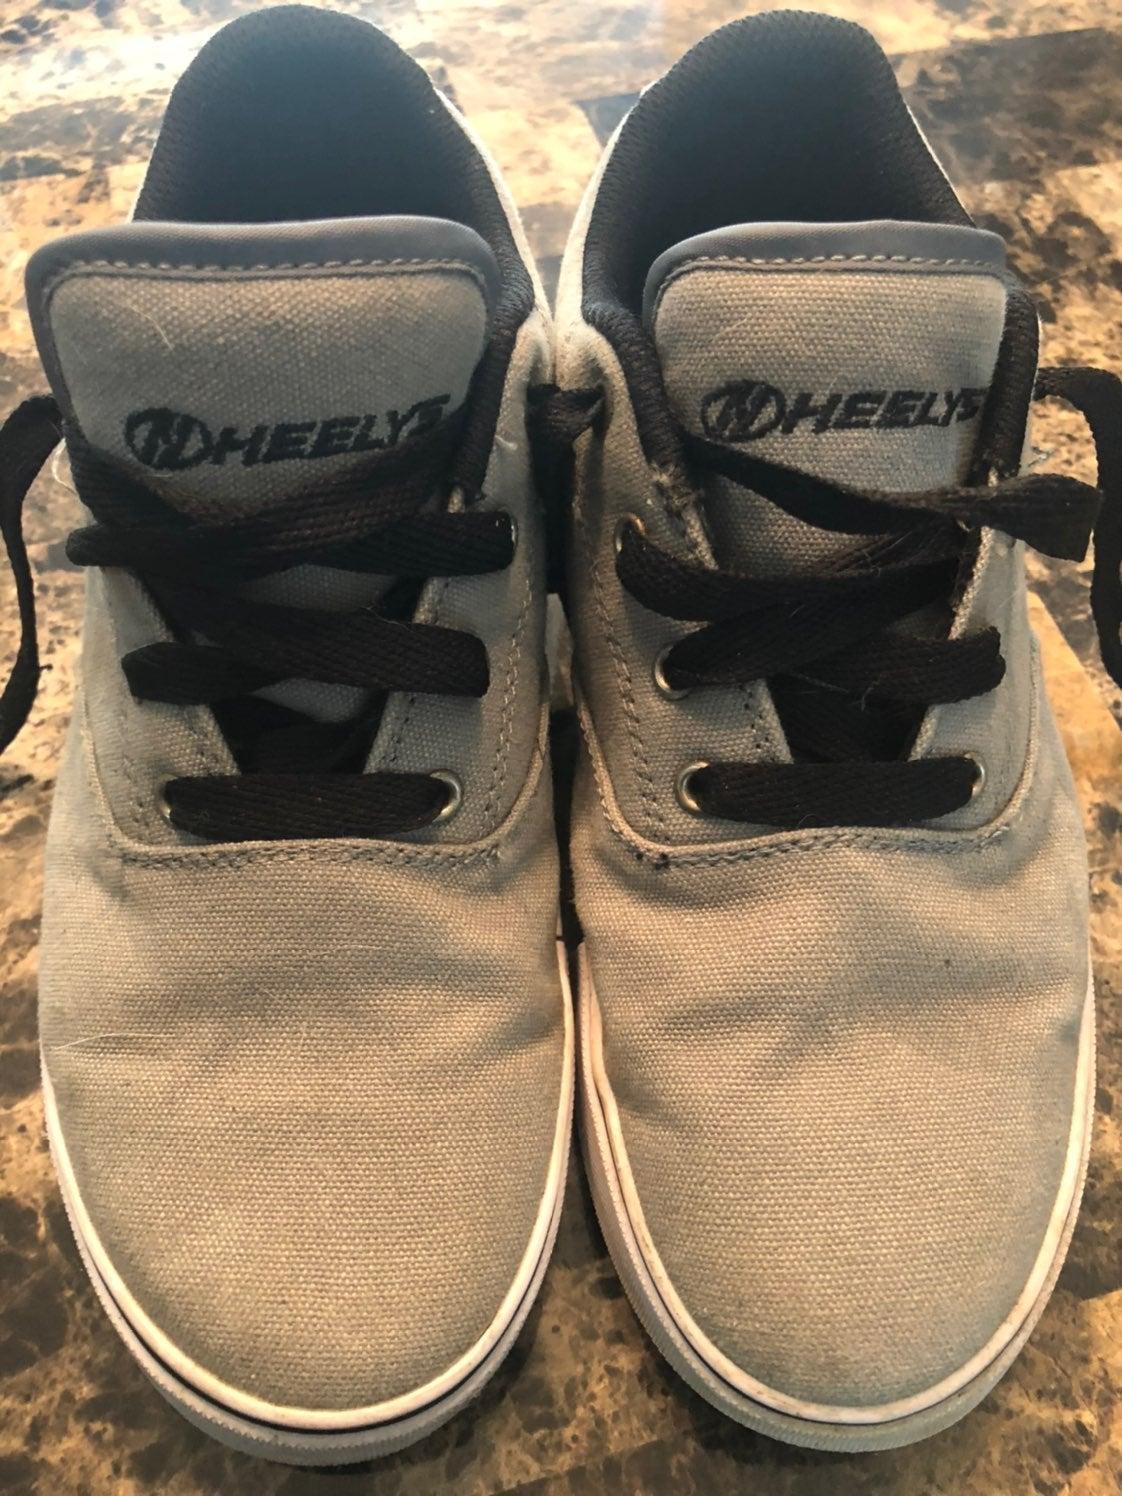 Heeleys skate shoes kids size 6